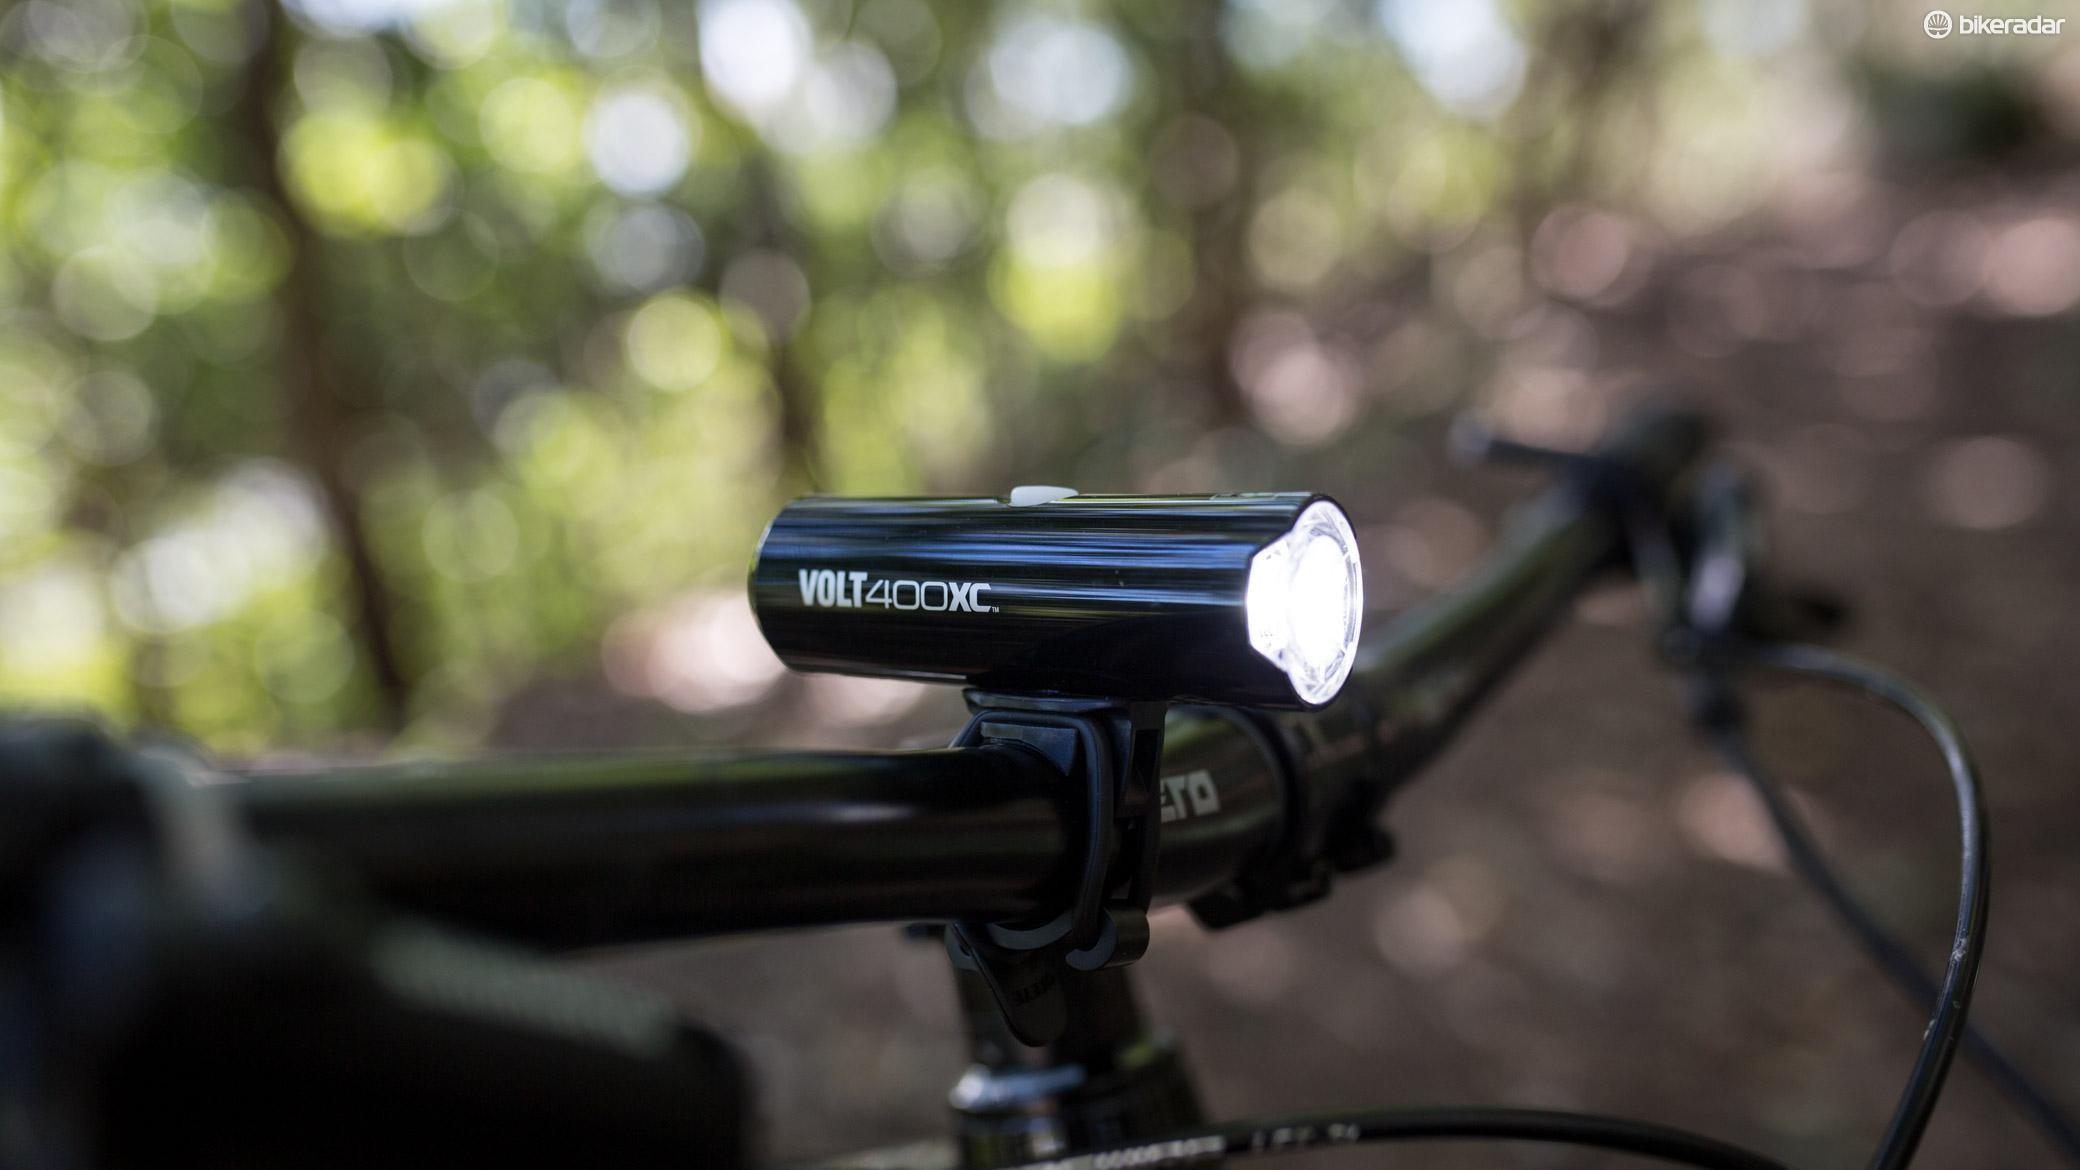 Cateye's Volt 400 XC is a sleek looking 400 lumen light